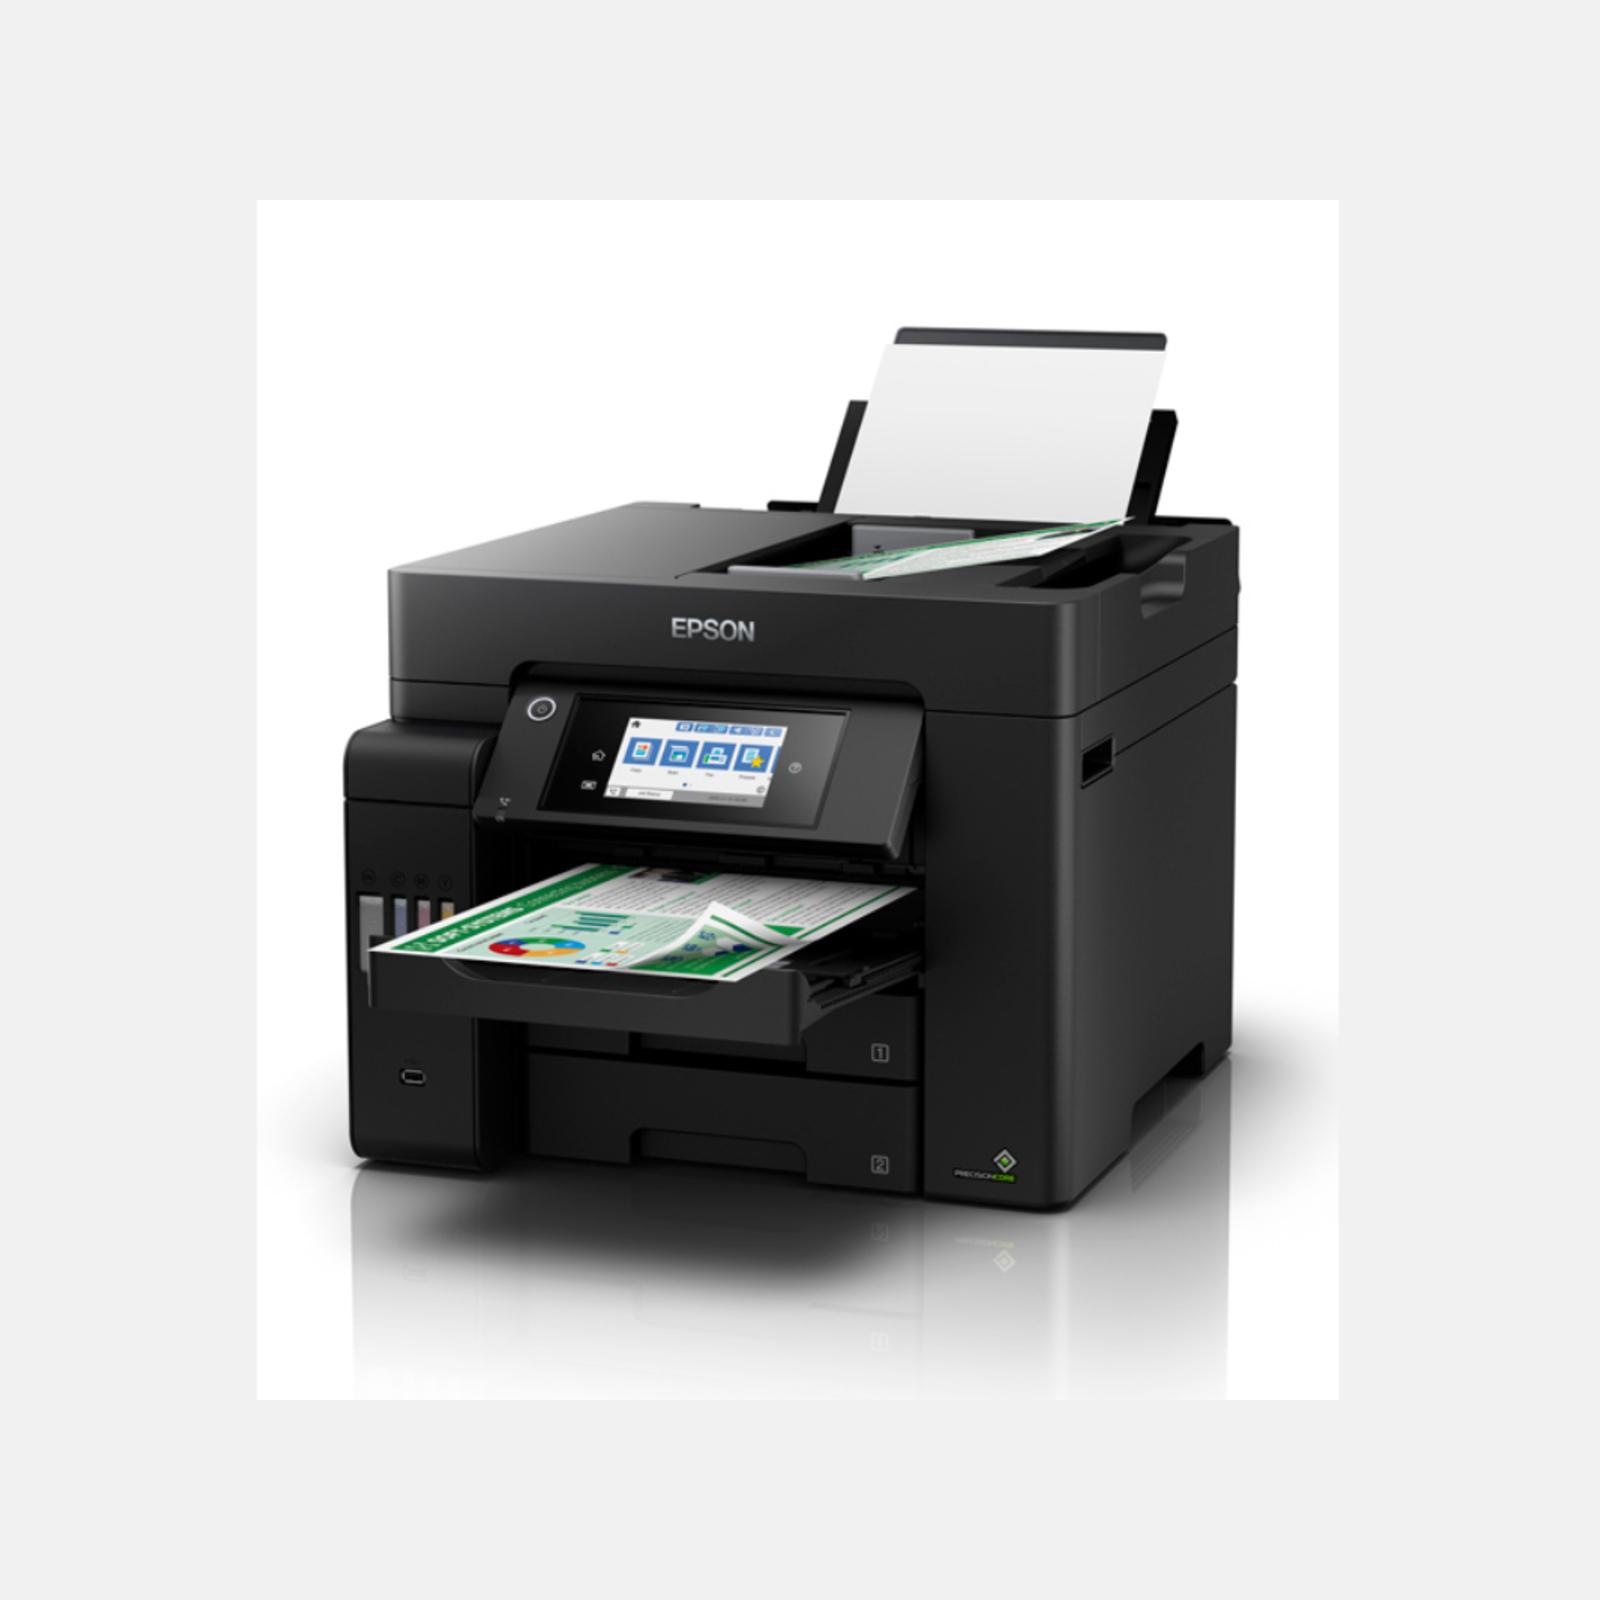 Epson EcoTank Pro ET-5800 Inkjet MFP - Print, Copy, Scan, Fax, Ethernet, Wi-Fi Direct